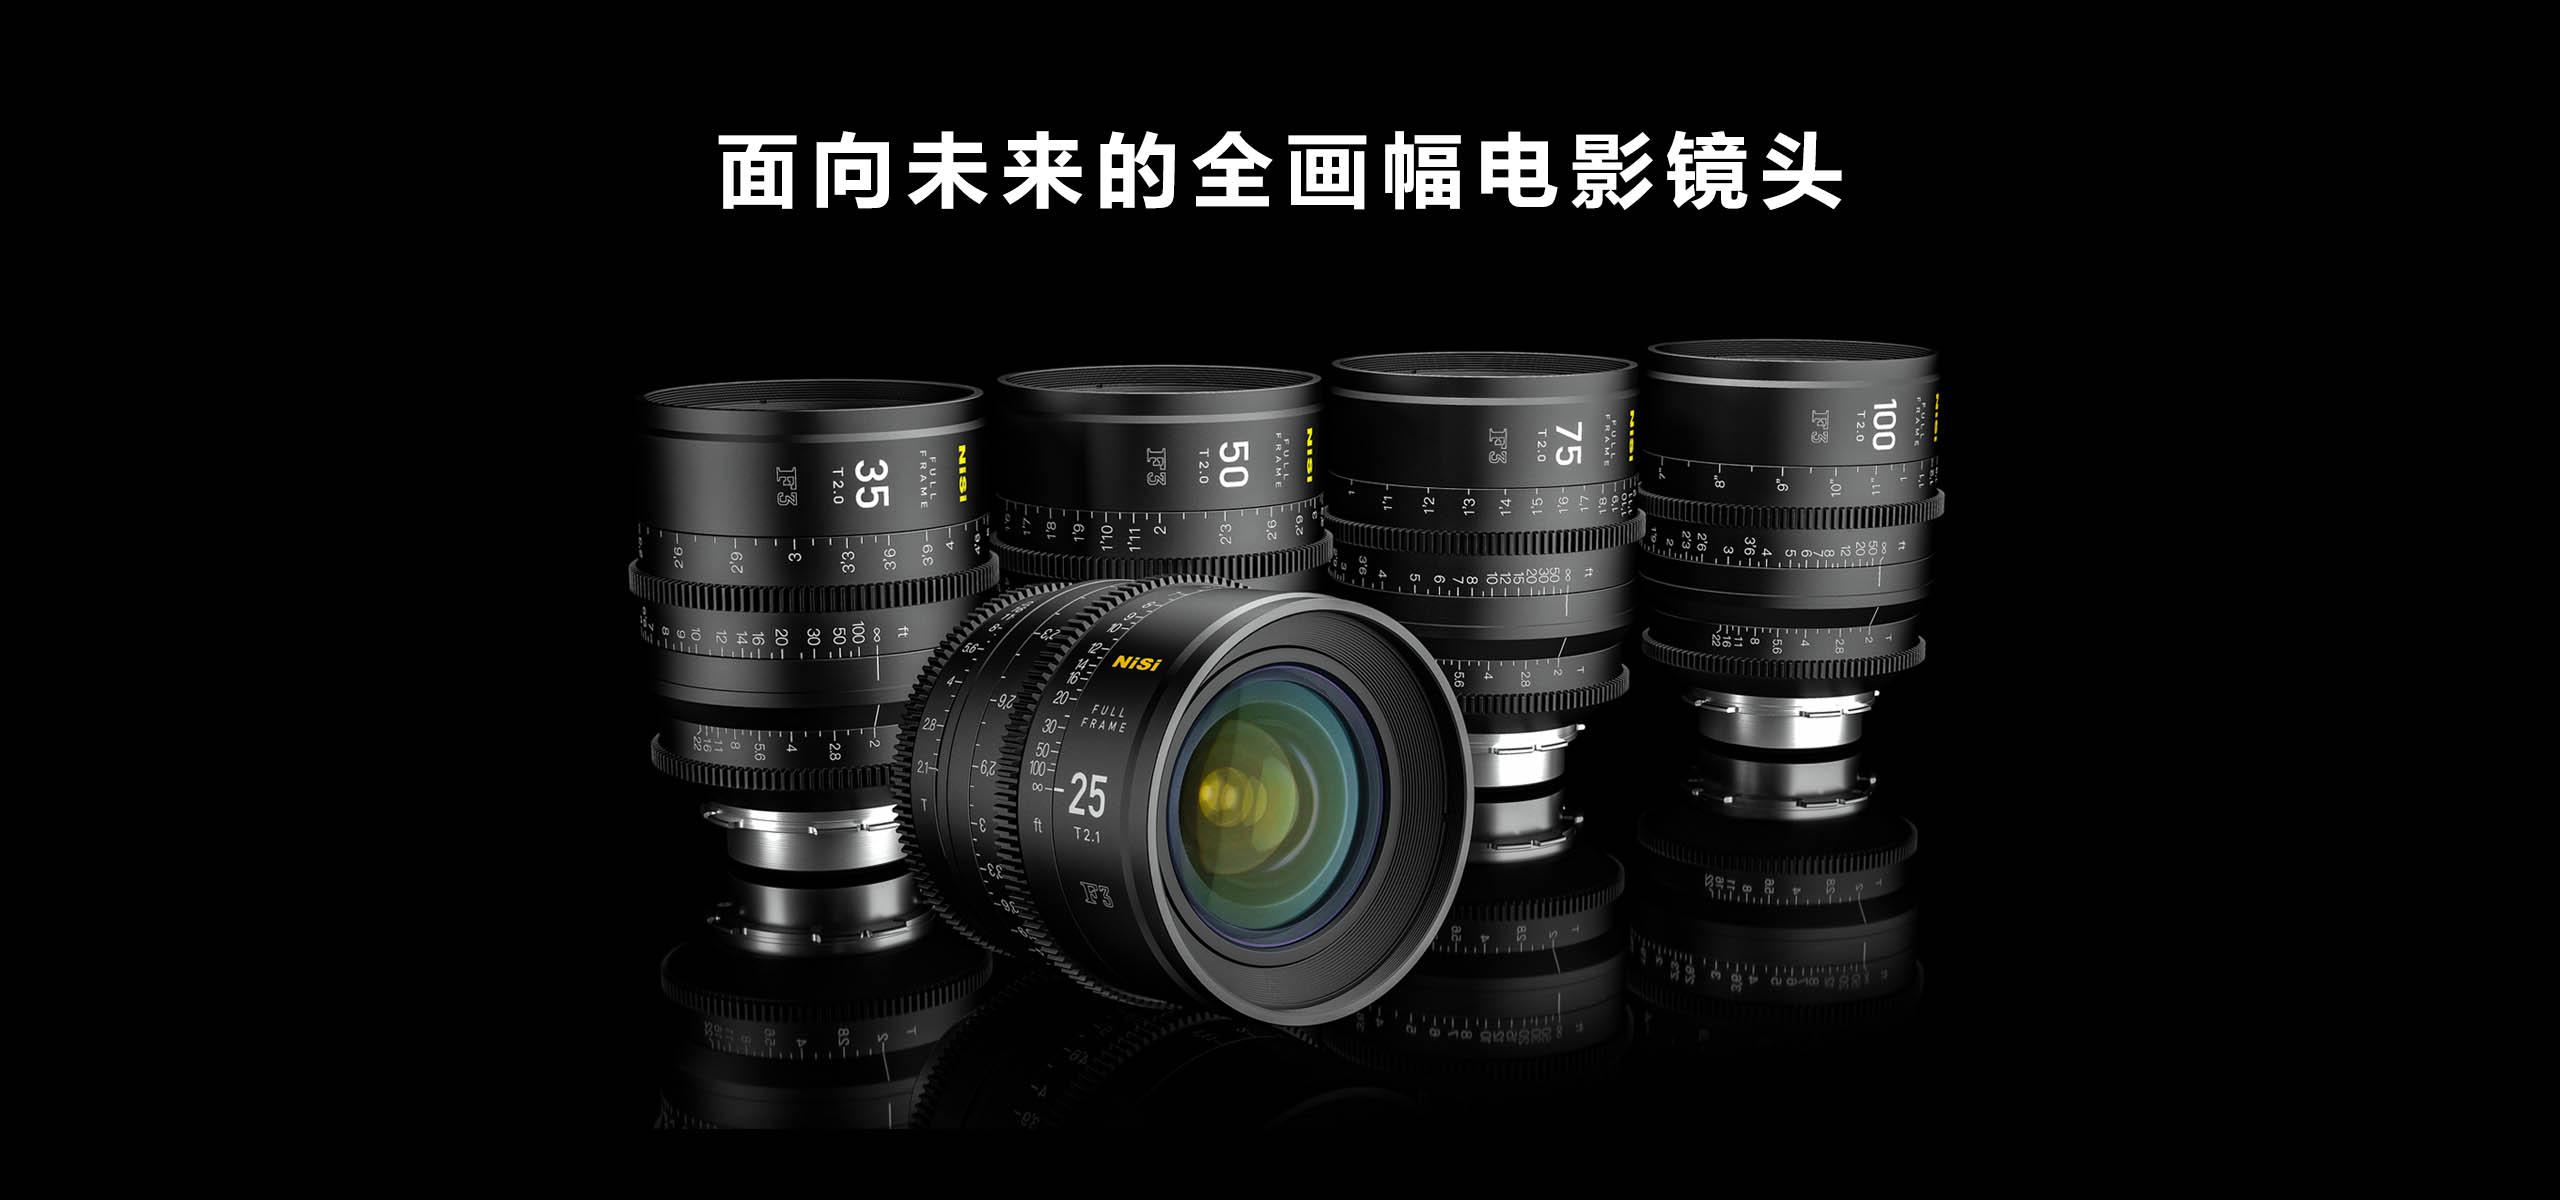 NiSi 全画幅电影镜头 F3 即将发布